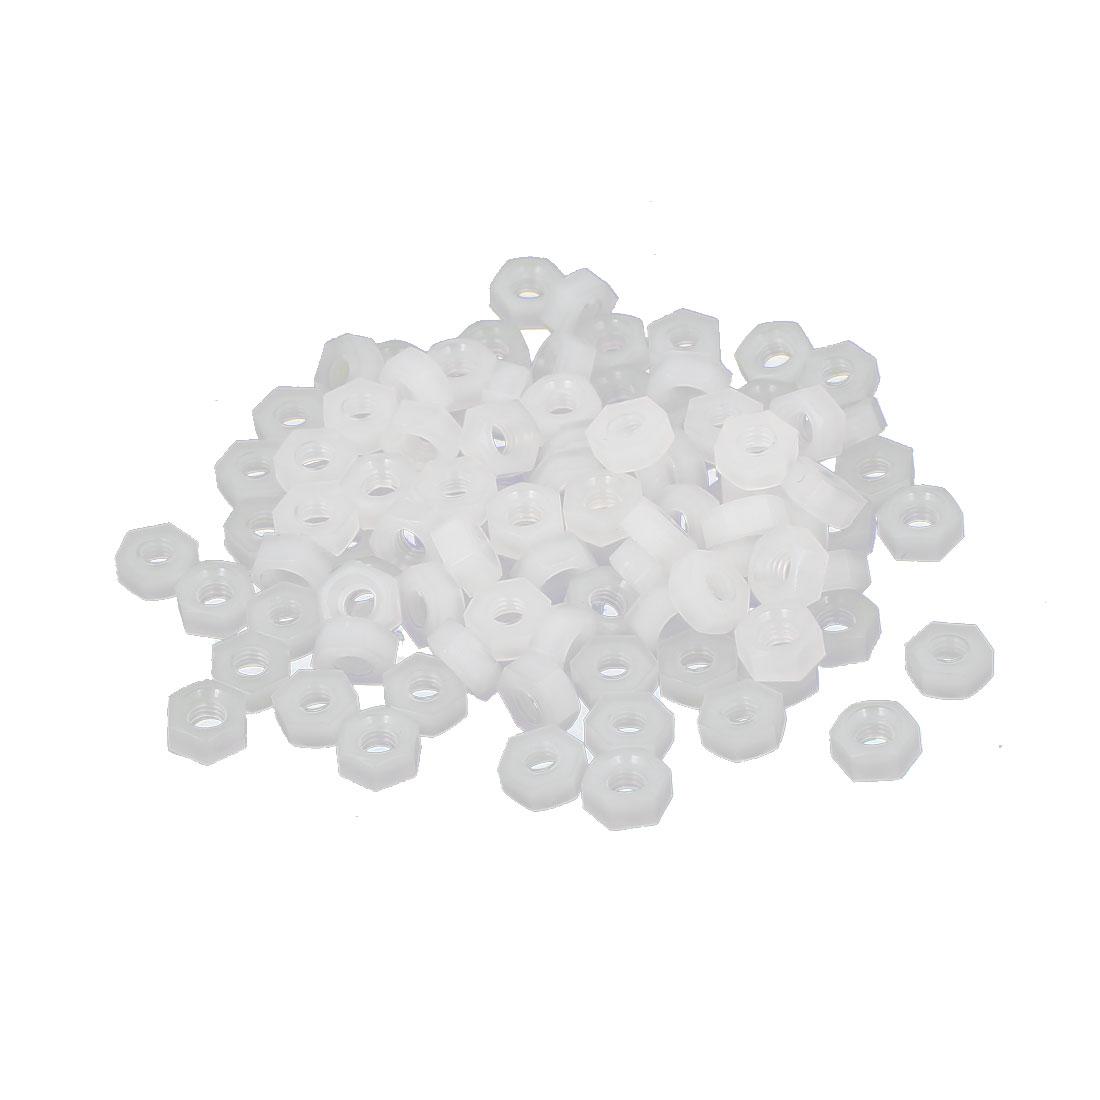 M2 Female Thread Nylon Hexagon Hex Nut Fastener Off-White 100PCS